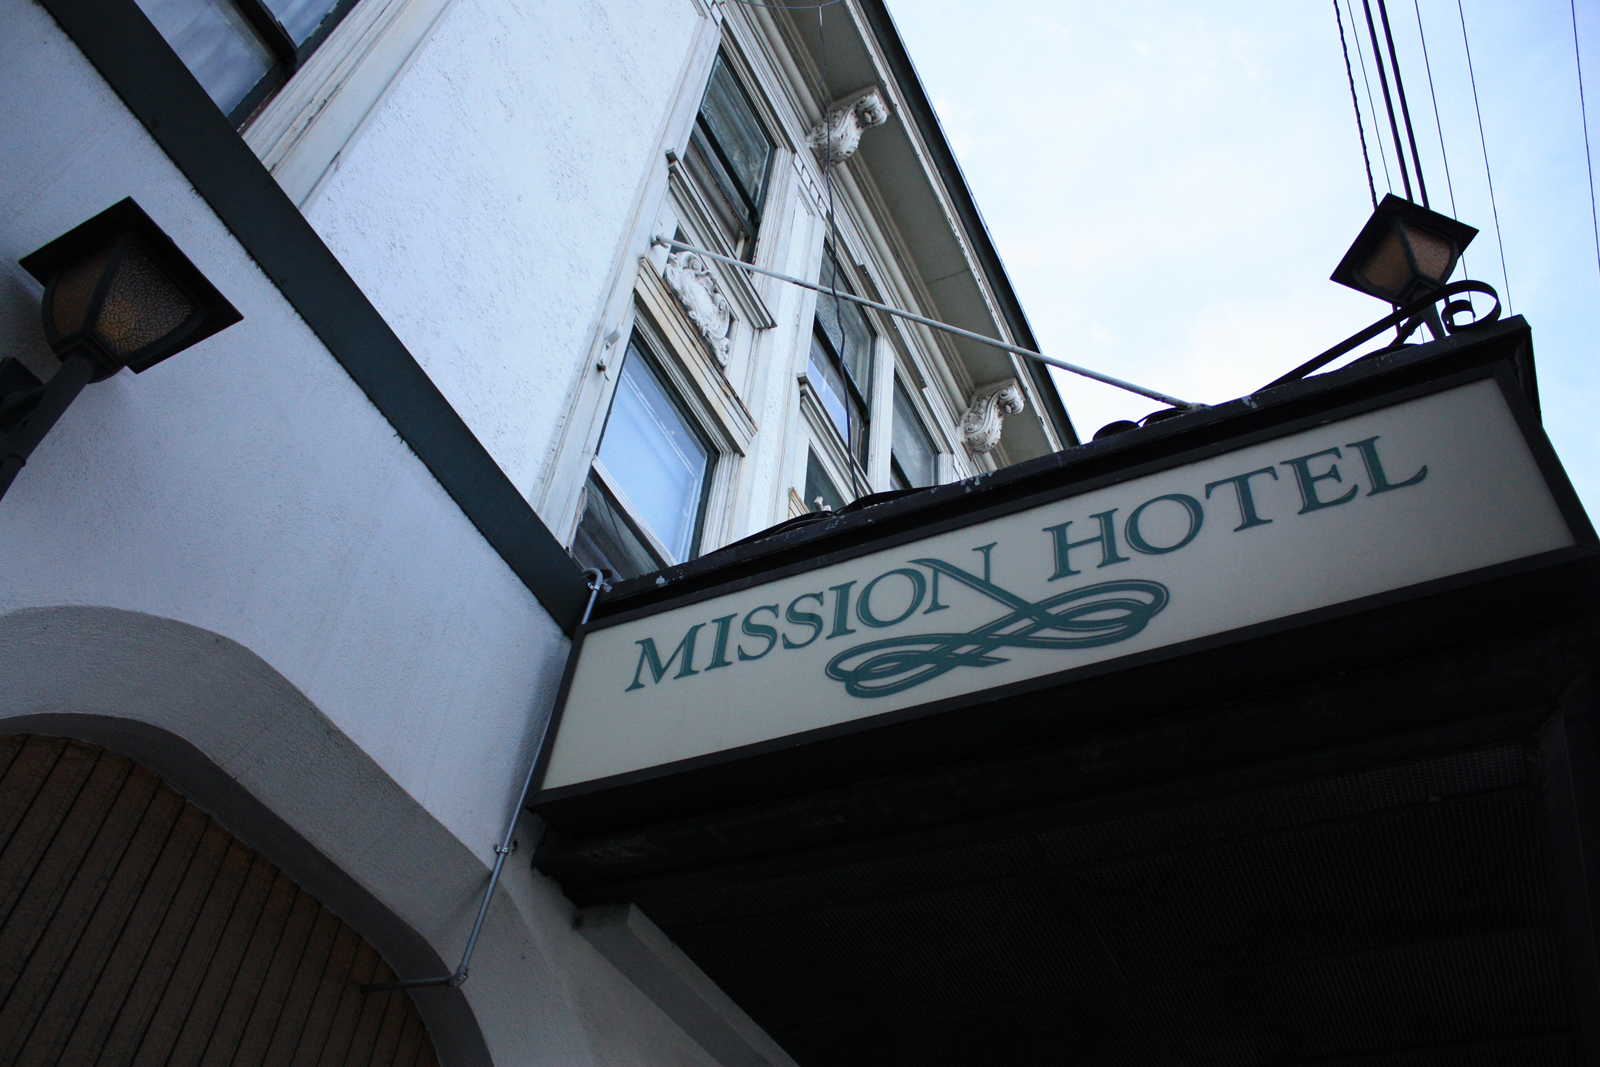 Mission Hotel